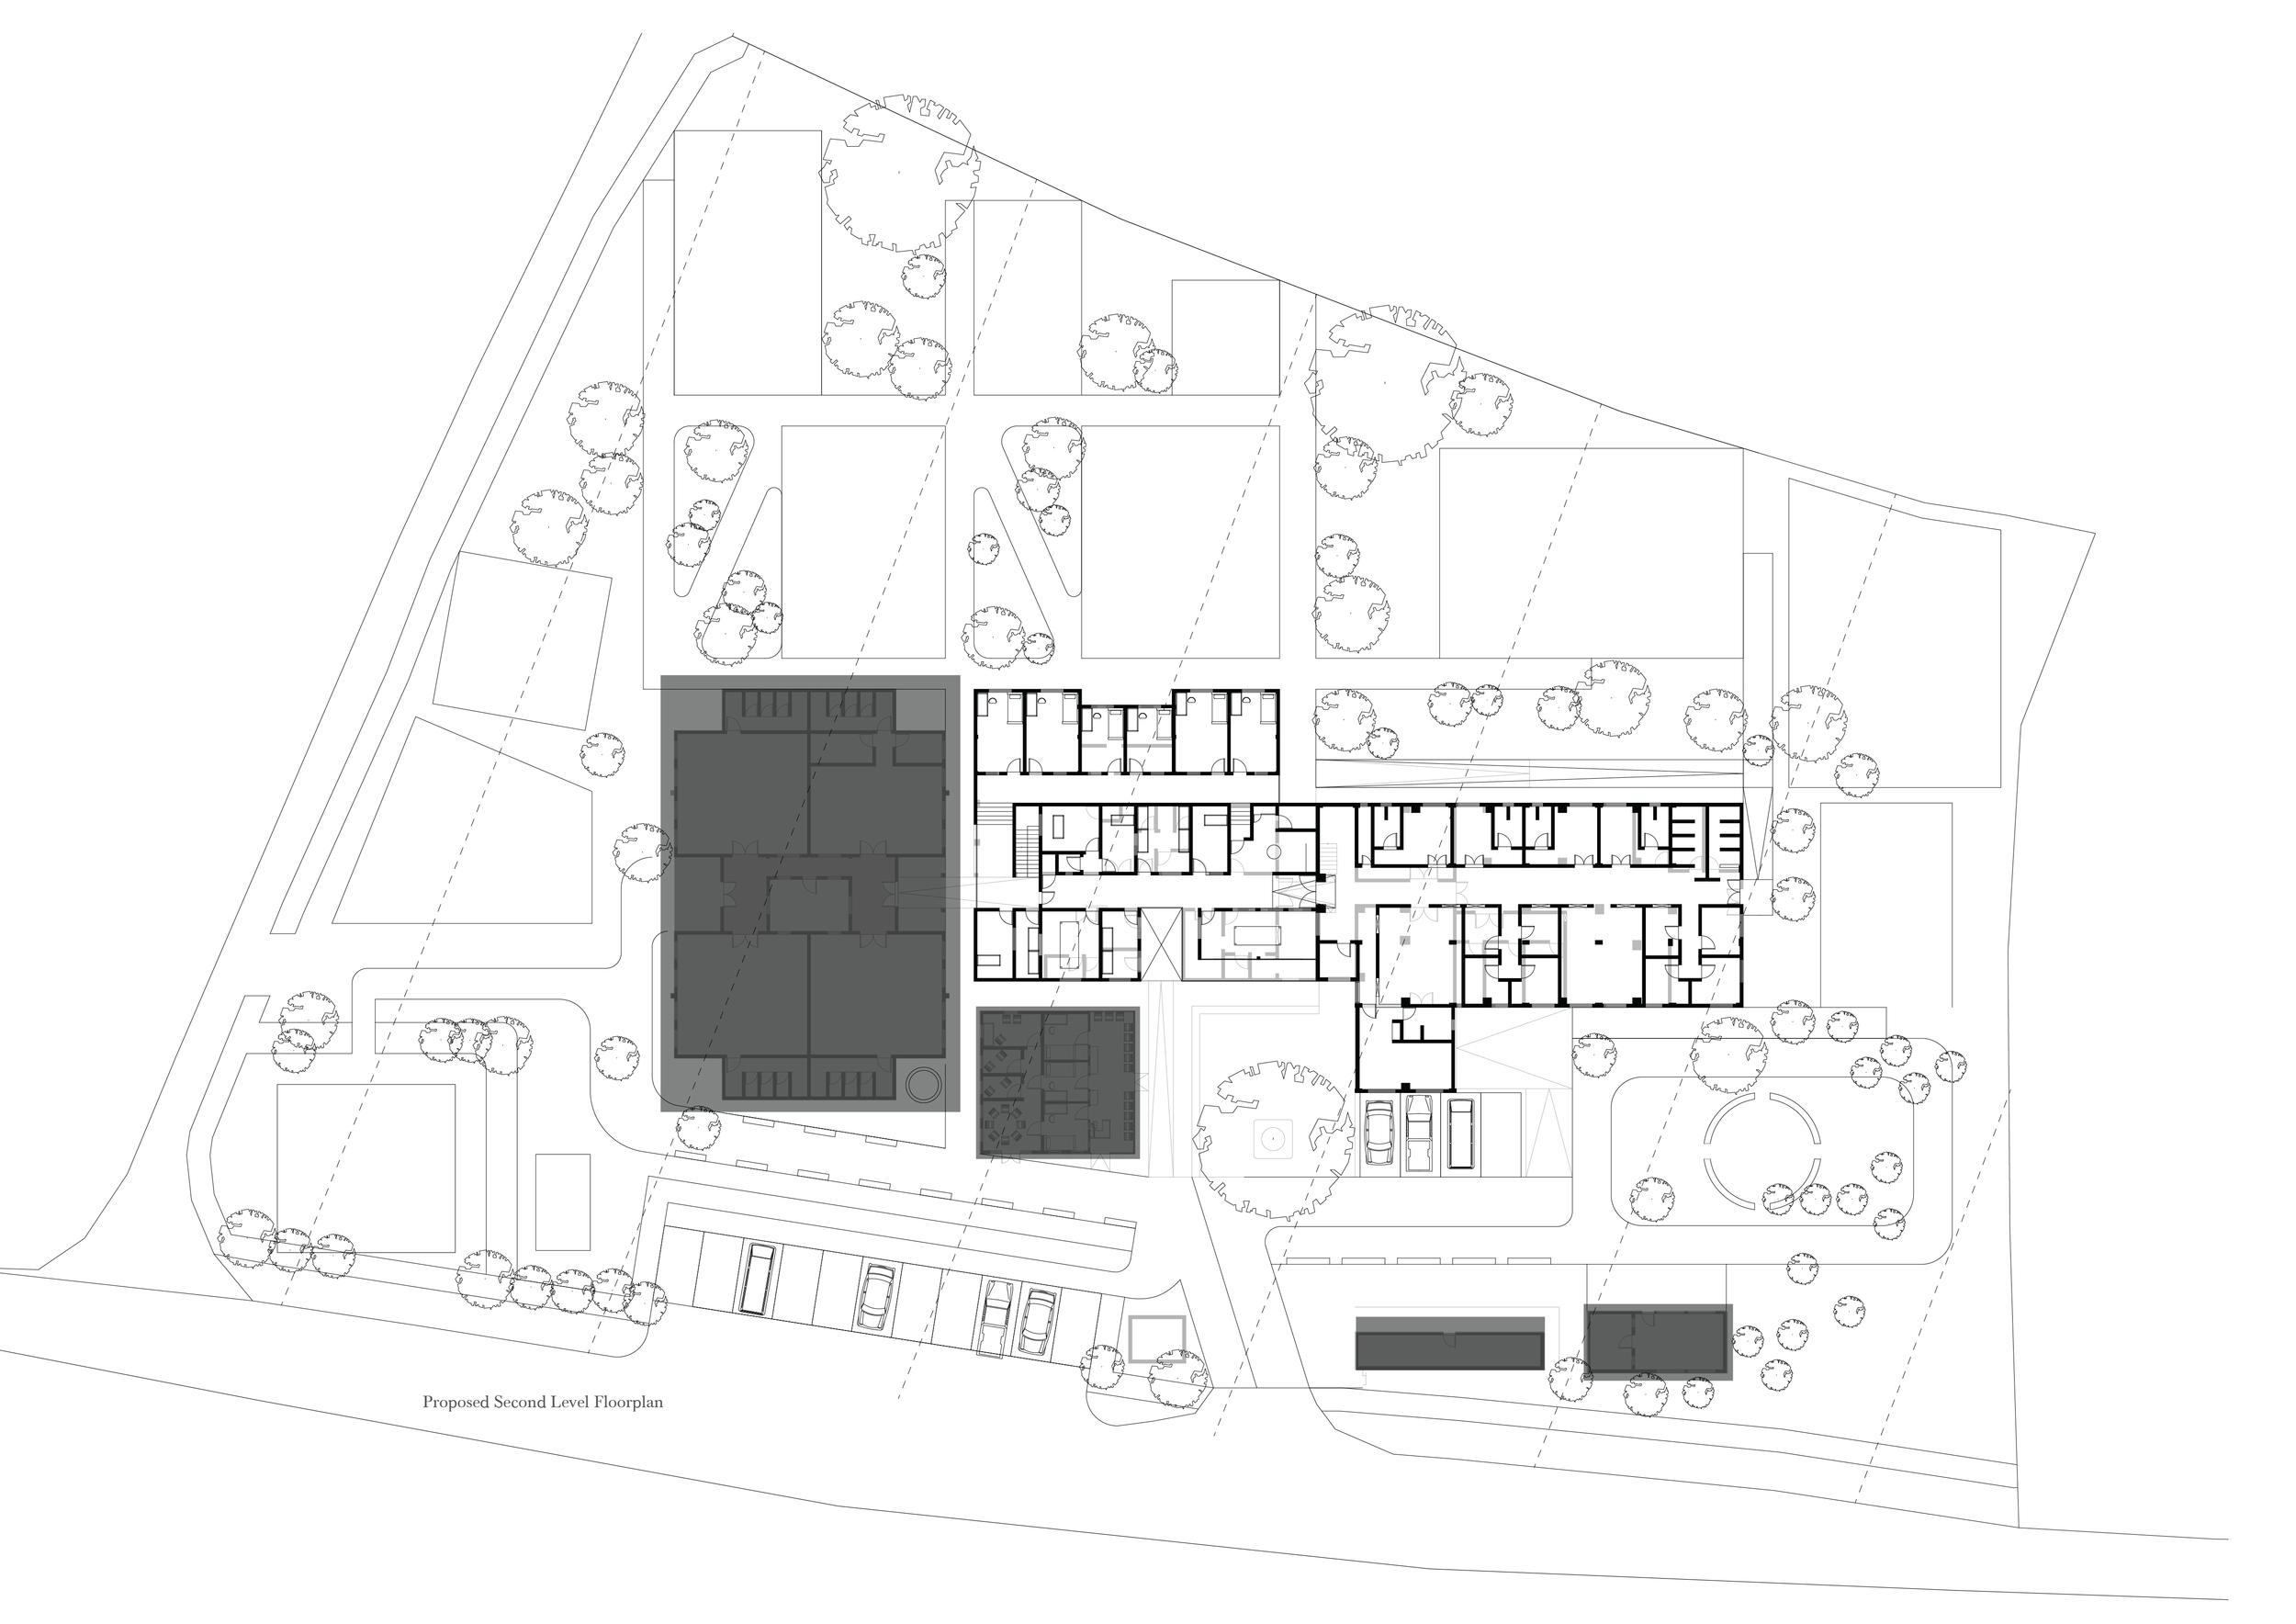 03_SagamHospital_Masterplan-06.jpg